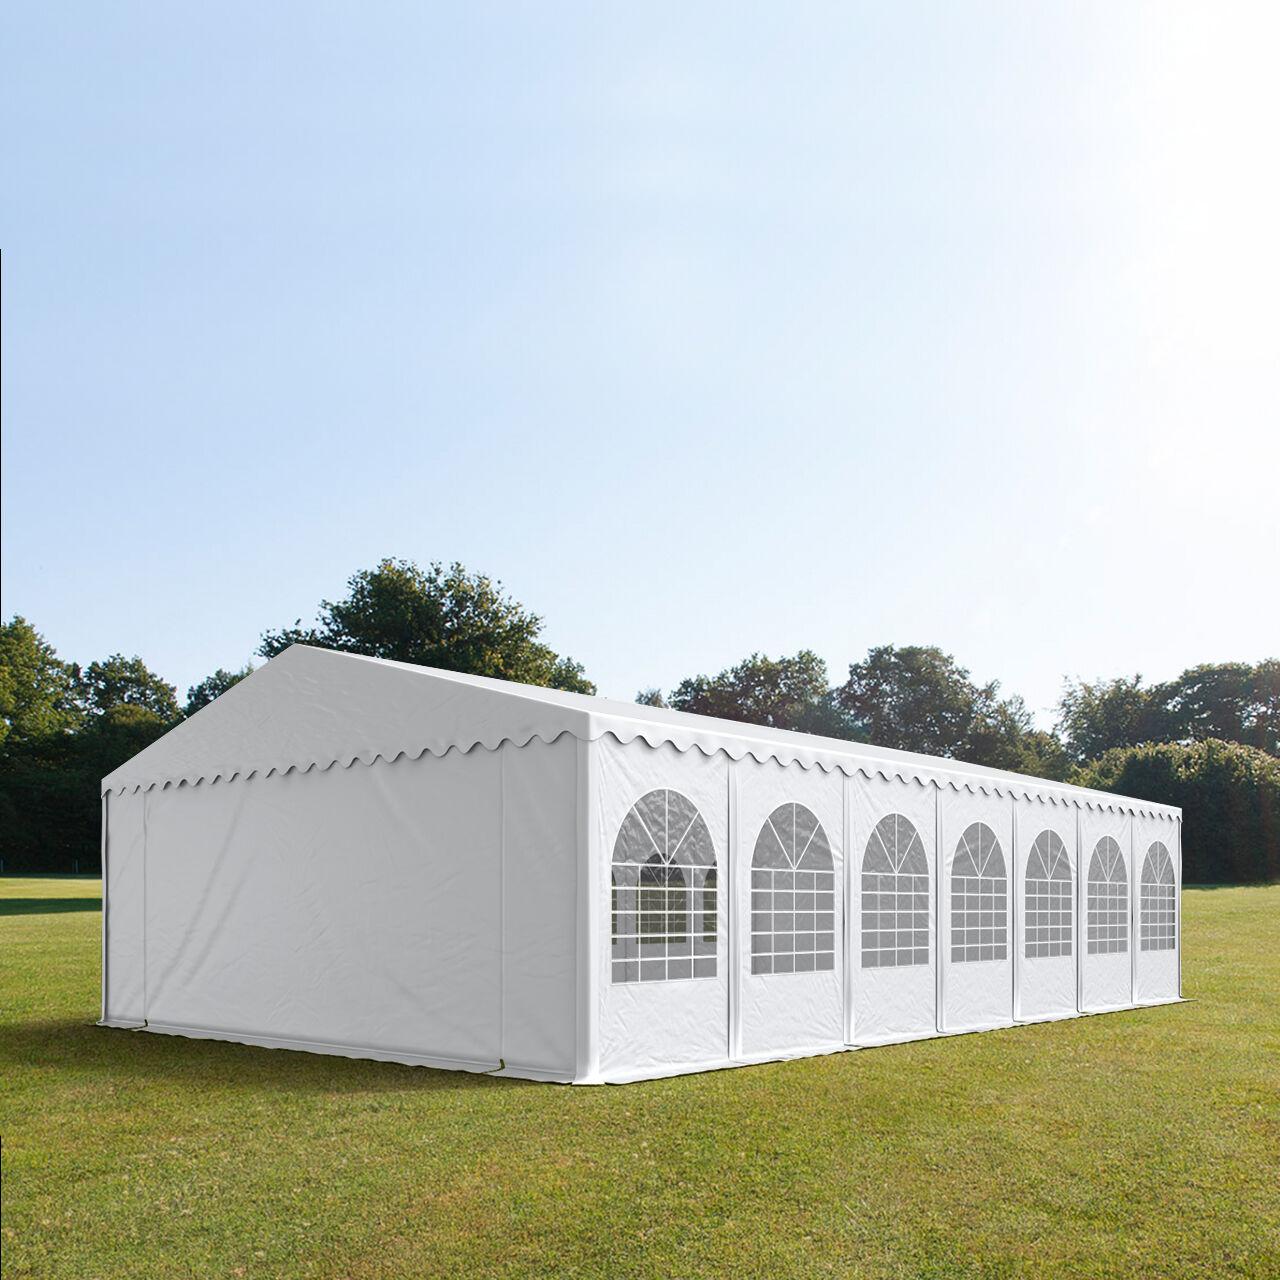 Toolport Tendone per Feste 7x14m PVC 550 g/m² bianco impermeabile